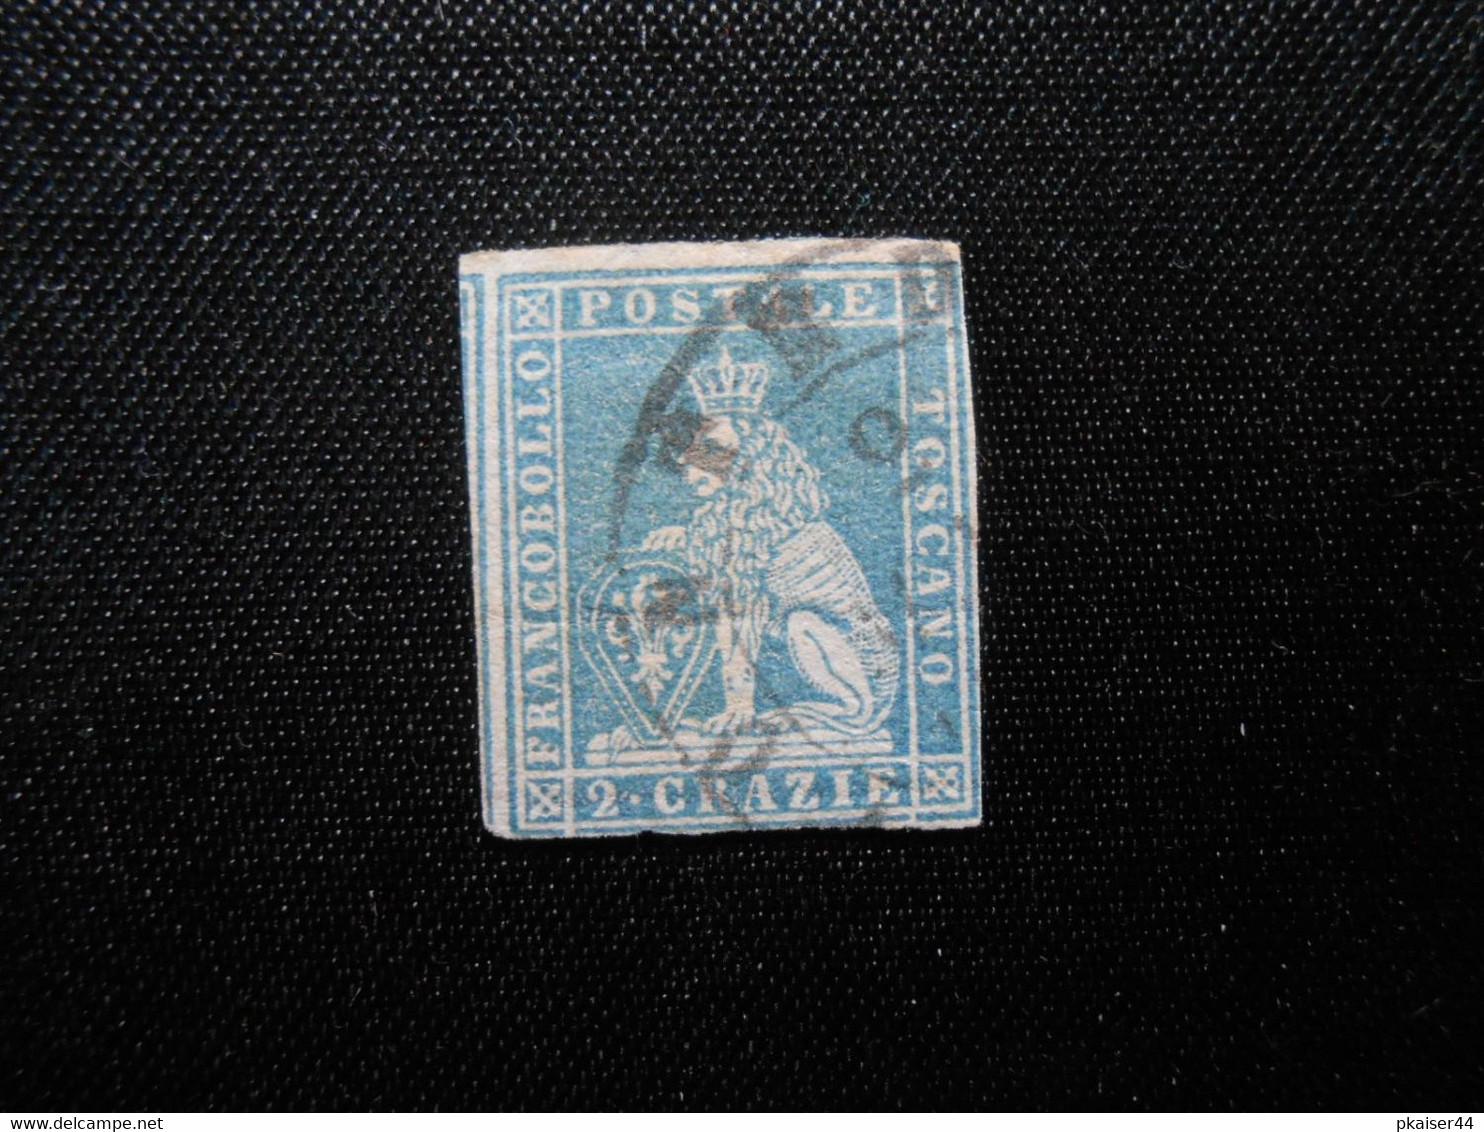 I Mi 5xb  2Cr - Italien - Toskana - 1851 - 170,00 € - Lot 560 - Toskana